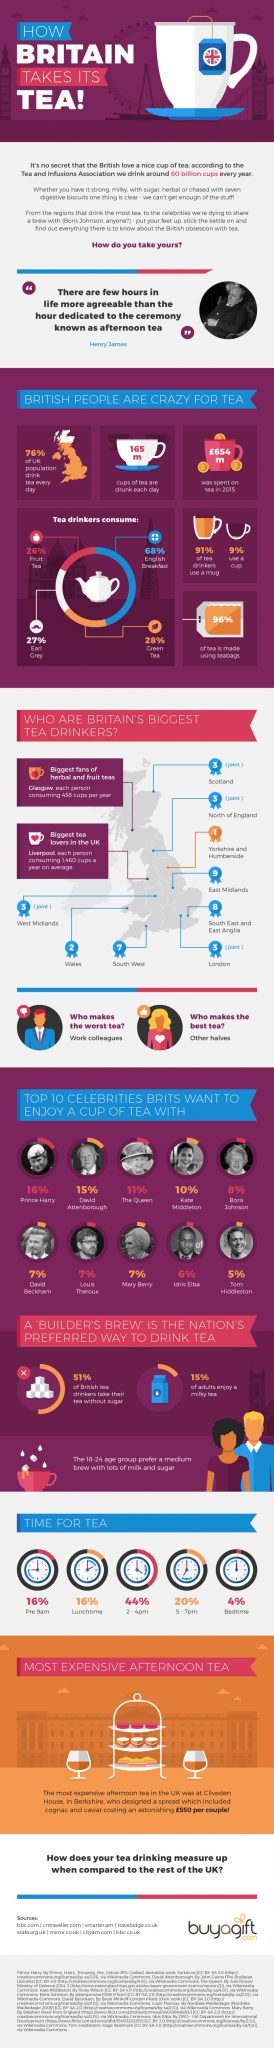 National Tea Week Infographic